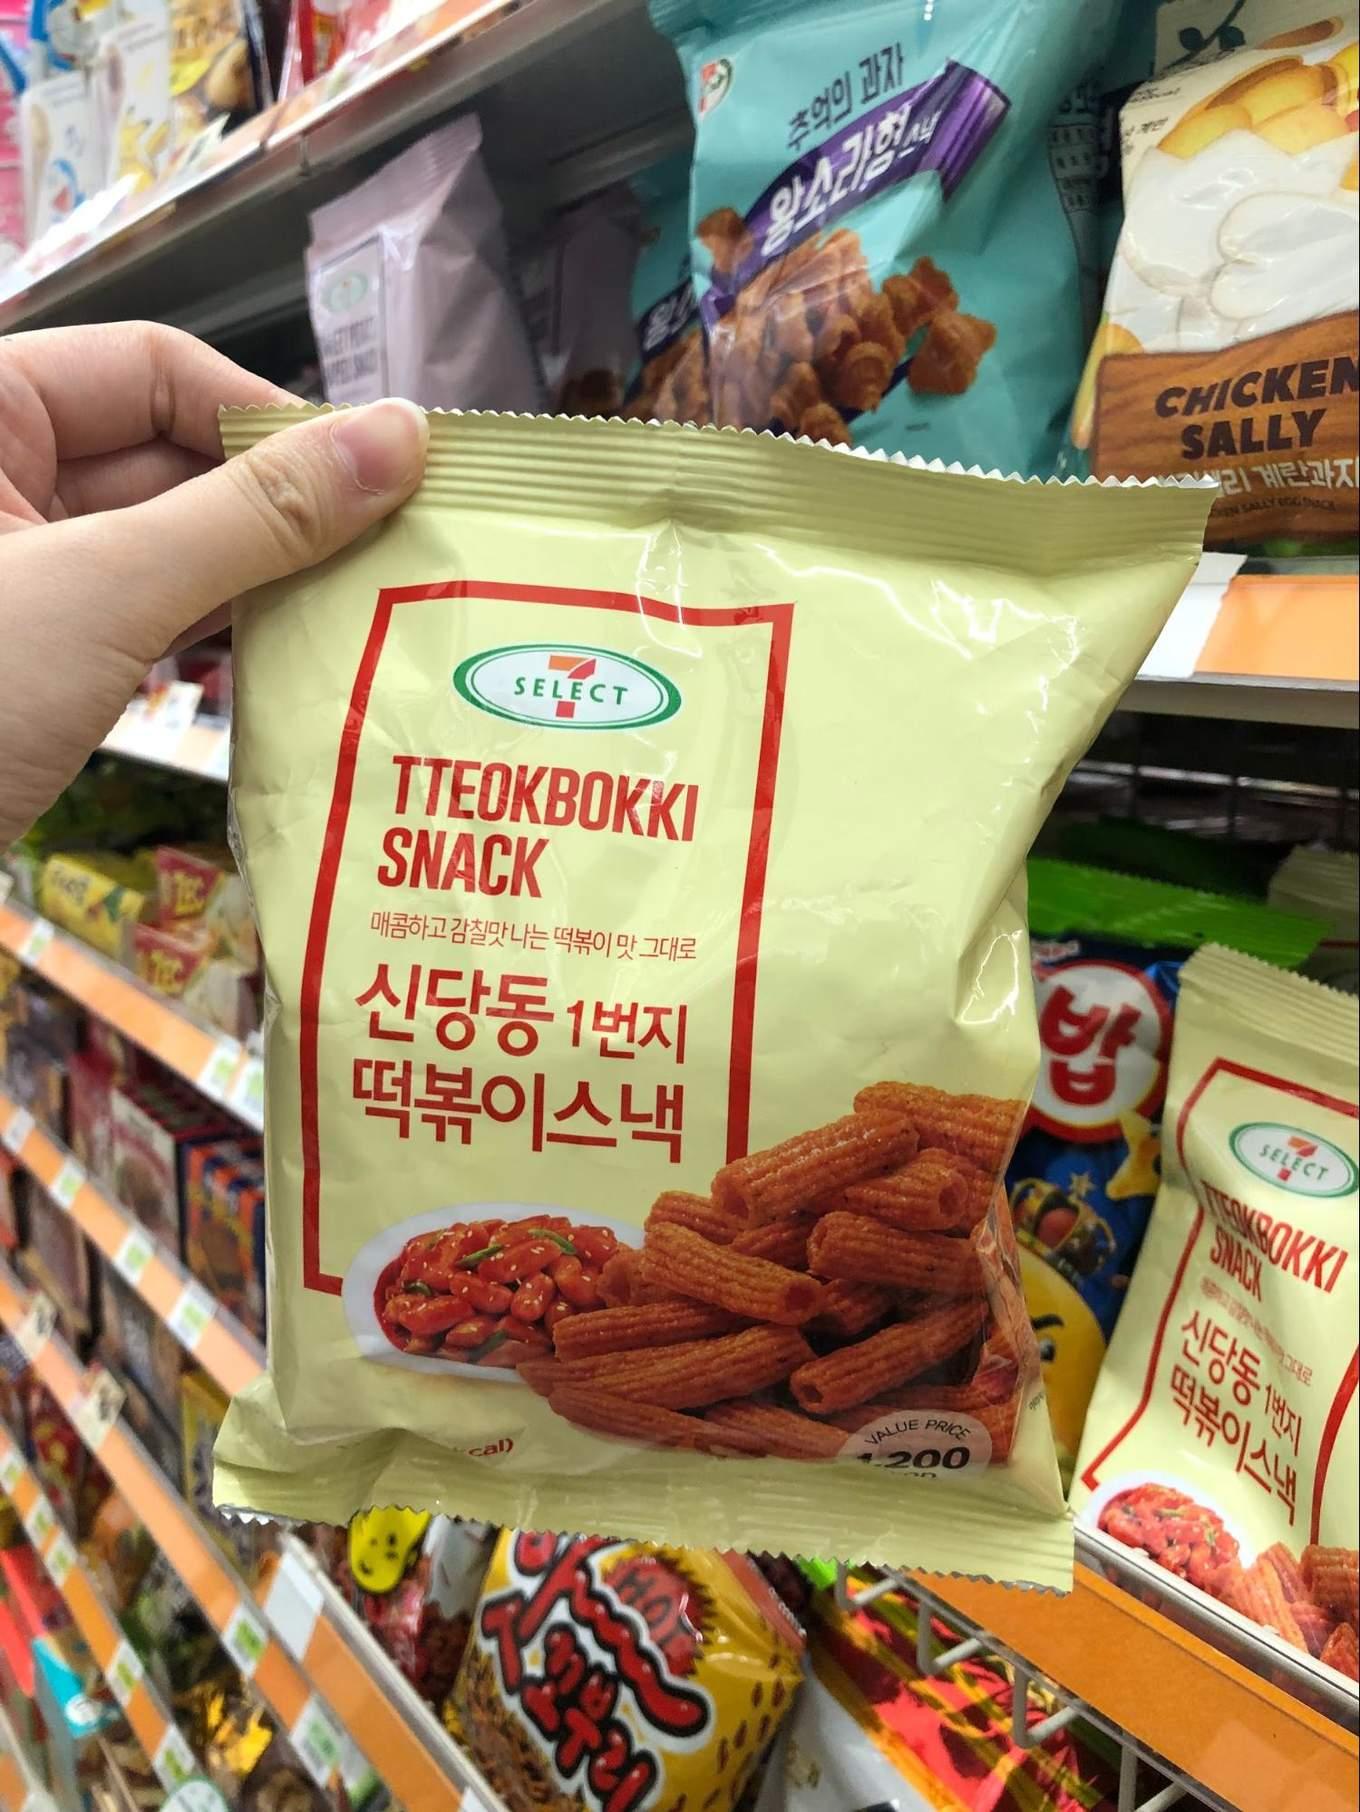 tteokbokki chips